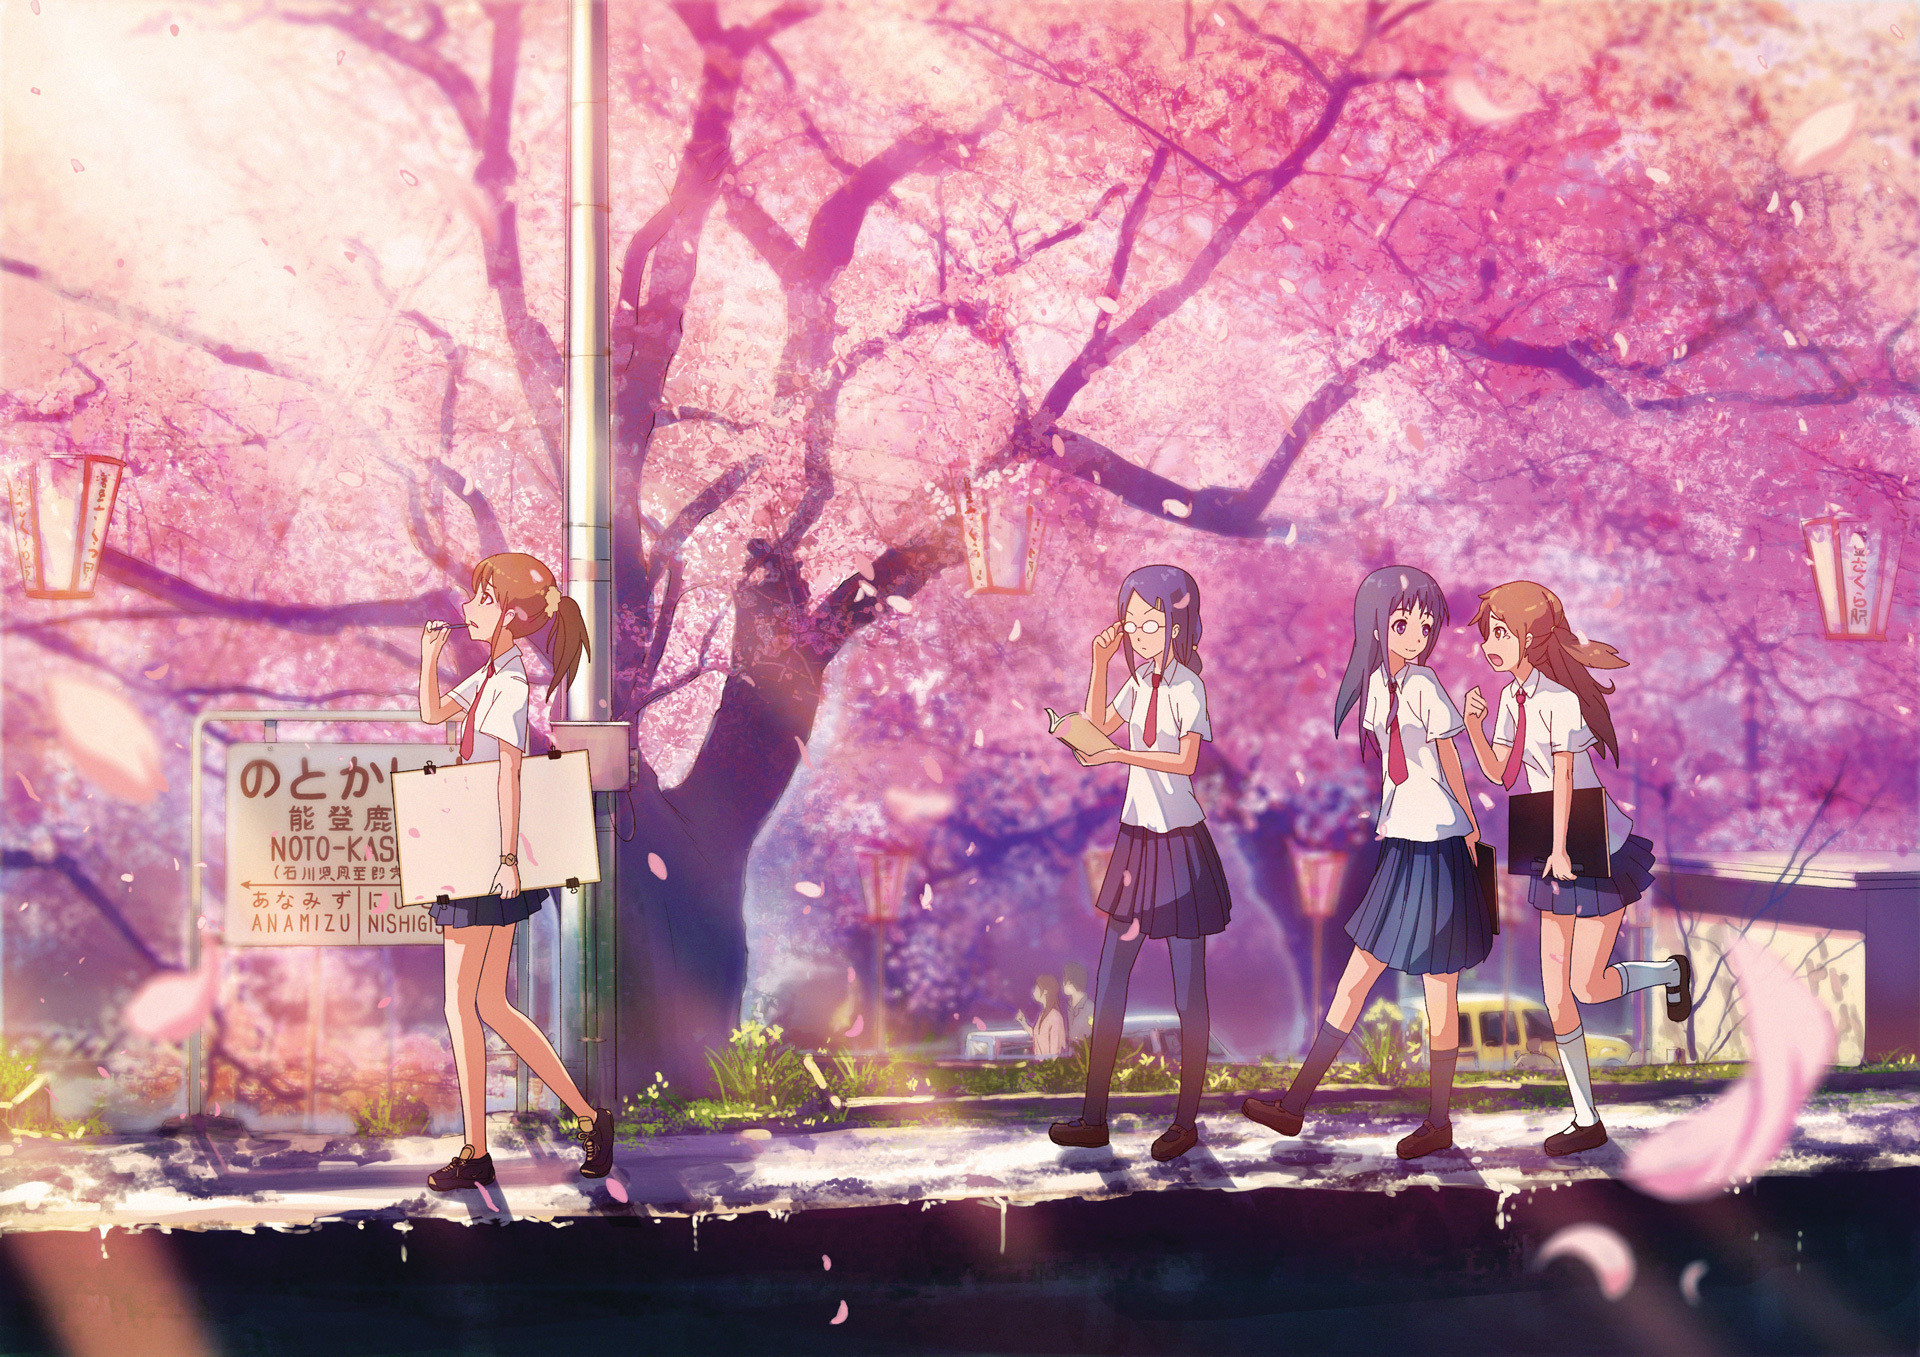 1920x1200 Sakura Blossom Wallpaper Free Background